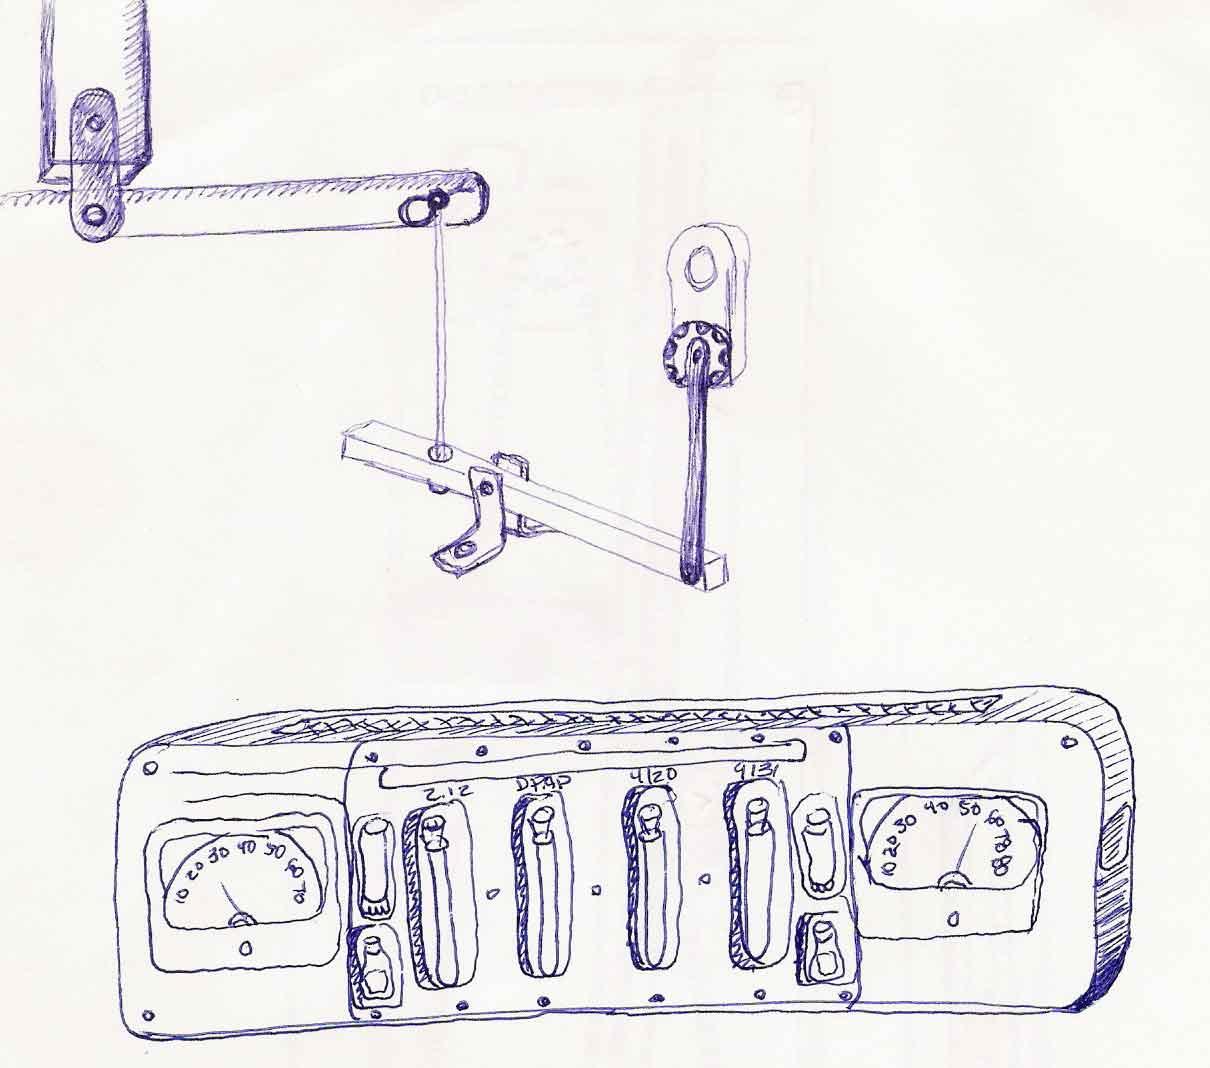 sketch-56-sept-05.jpg